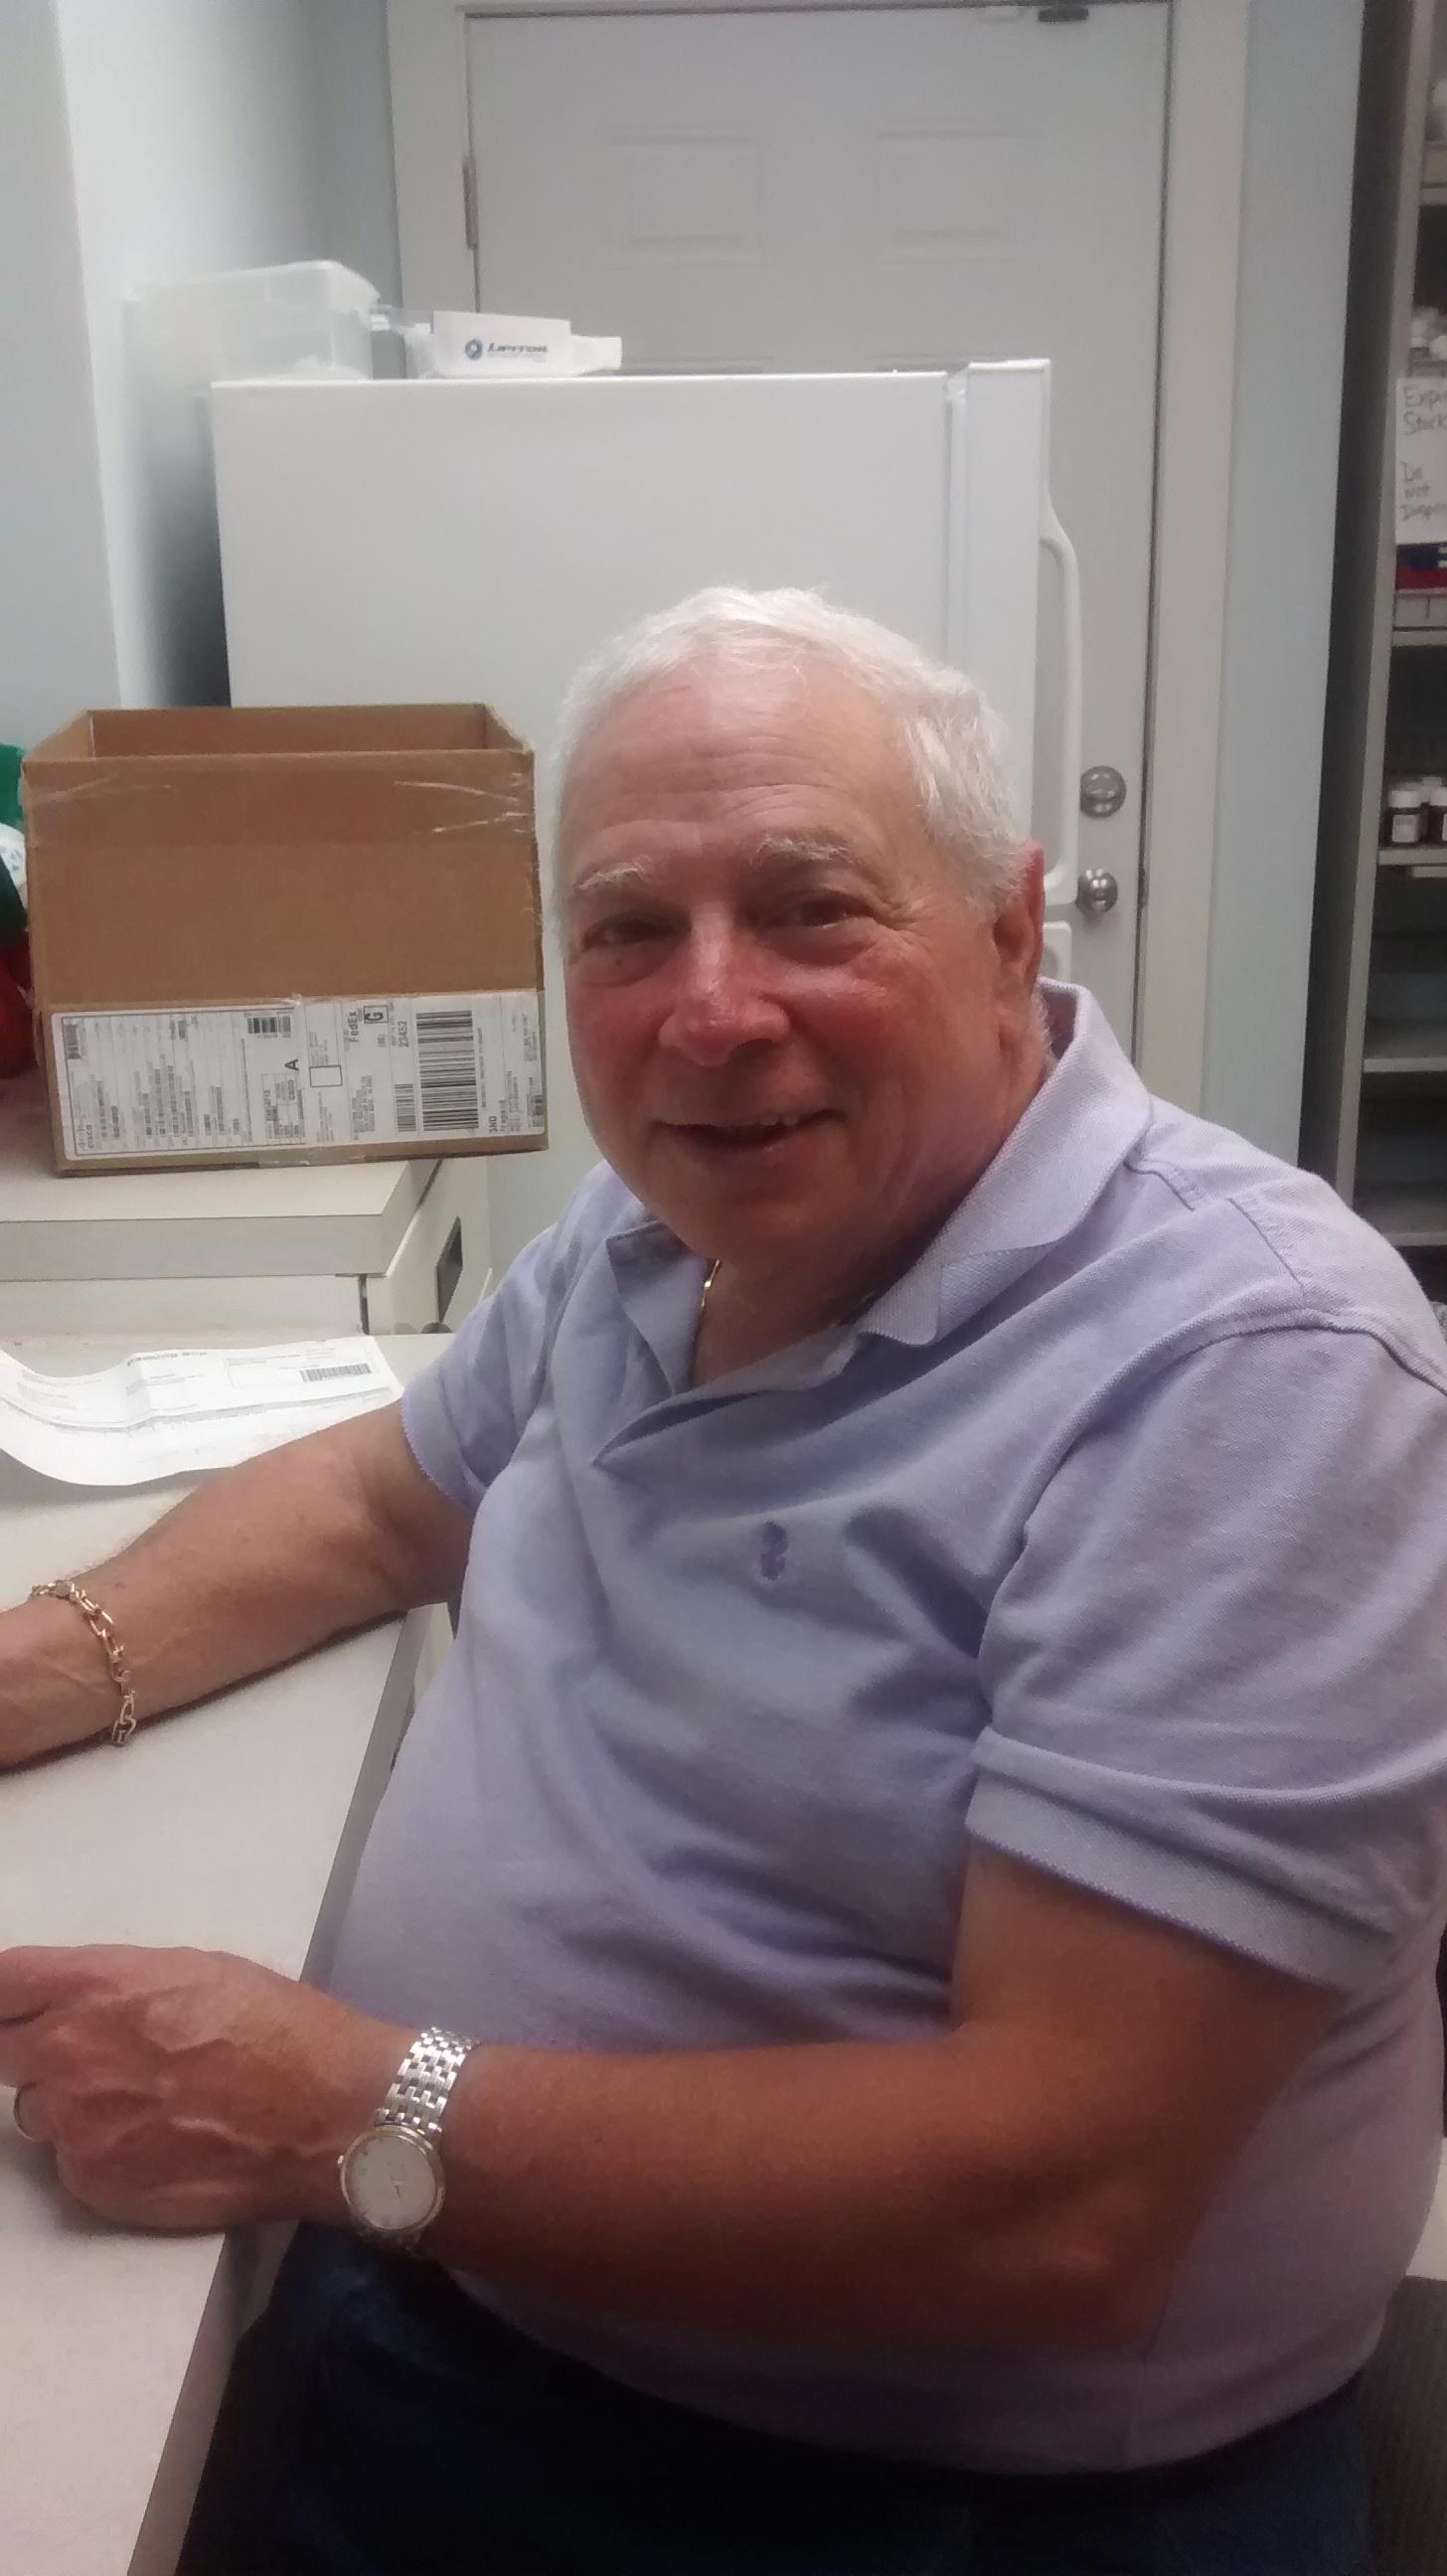 Dr Freedman